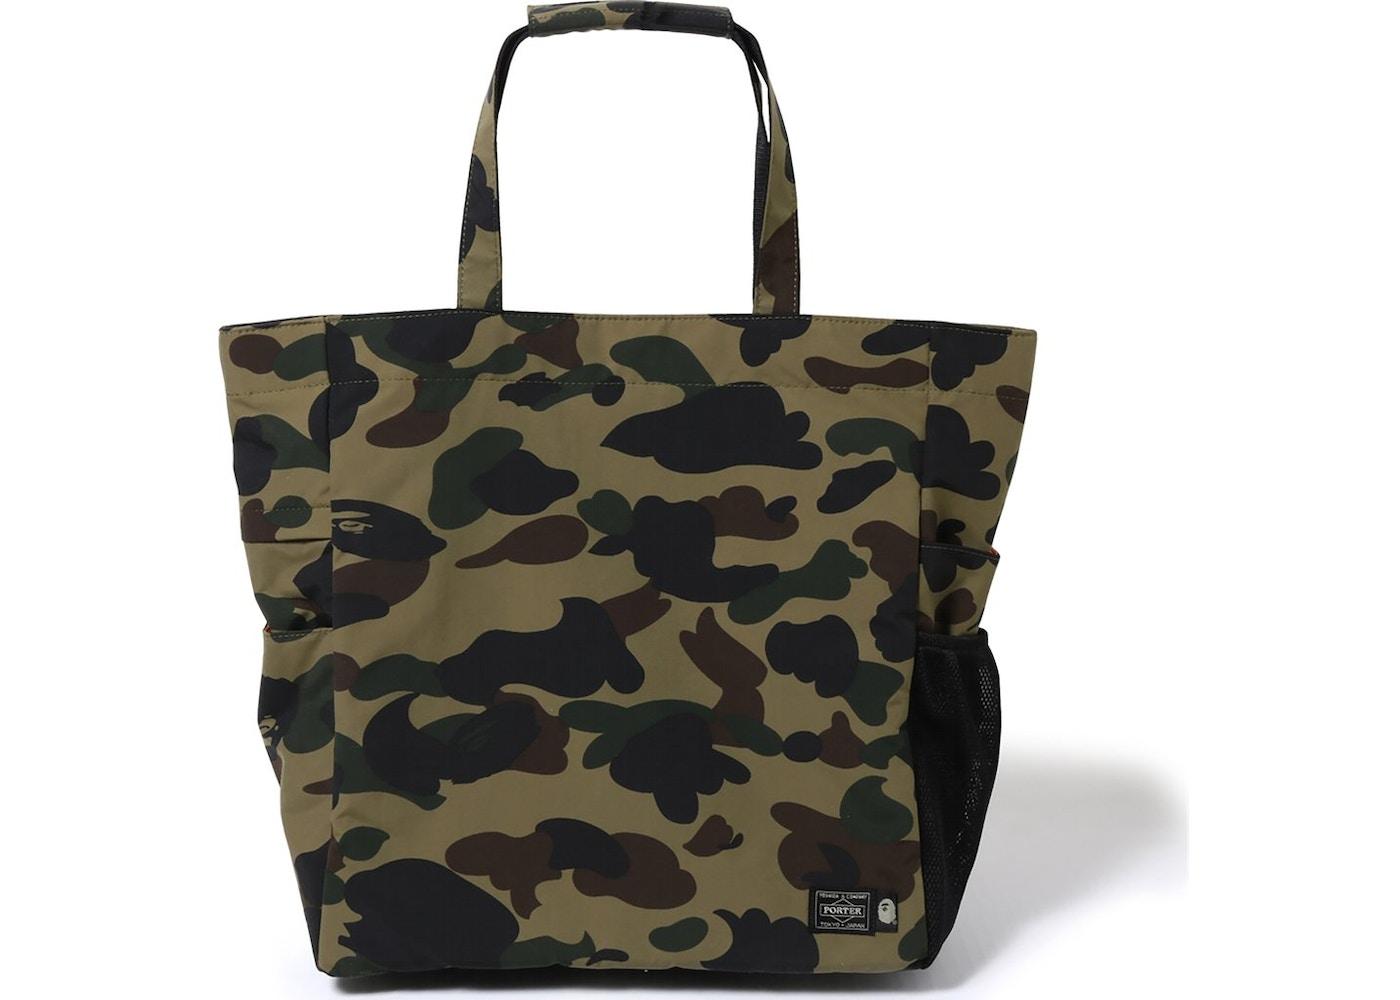 1bcf5d9c2d79b9 Streetwear - Bape Bags - Release Date